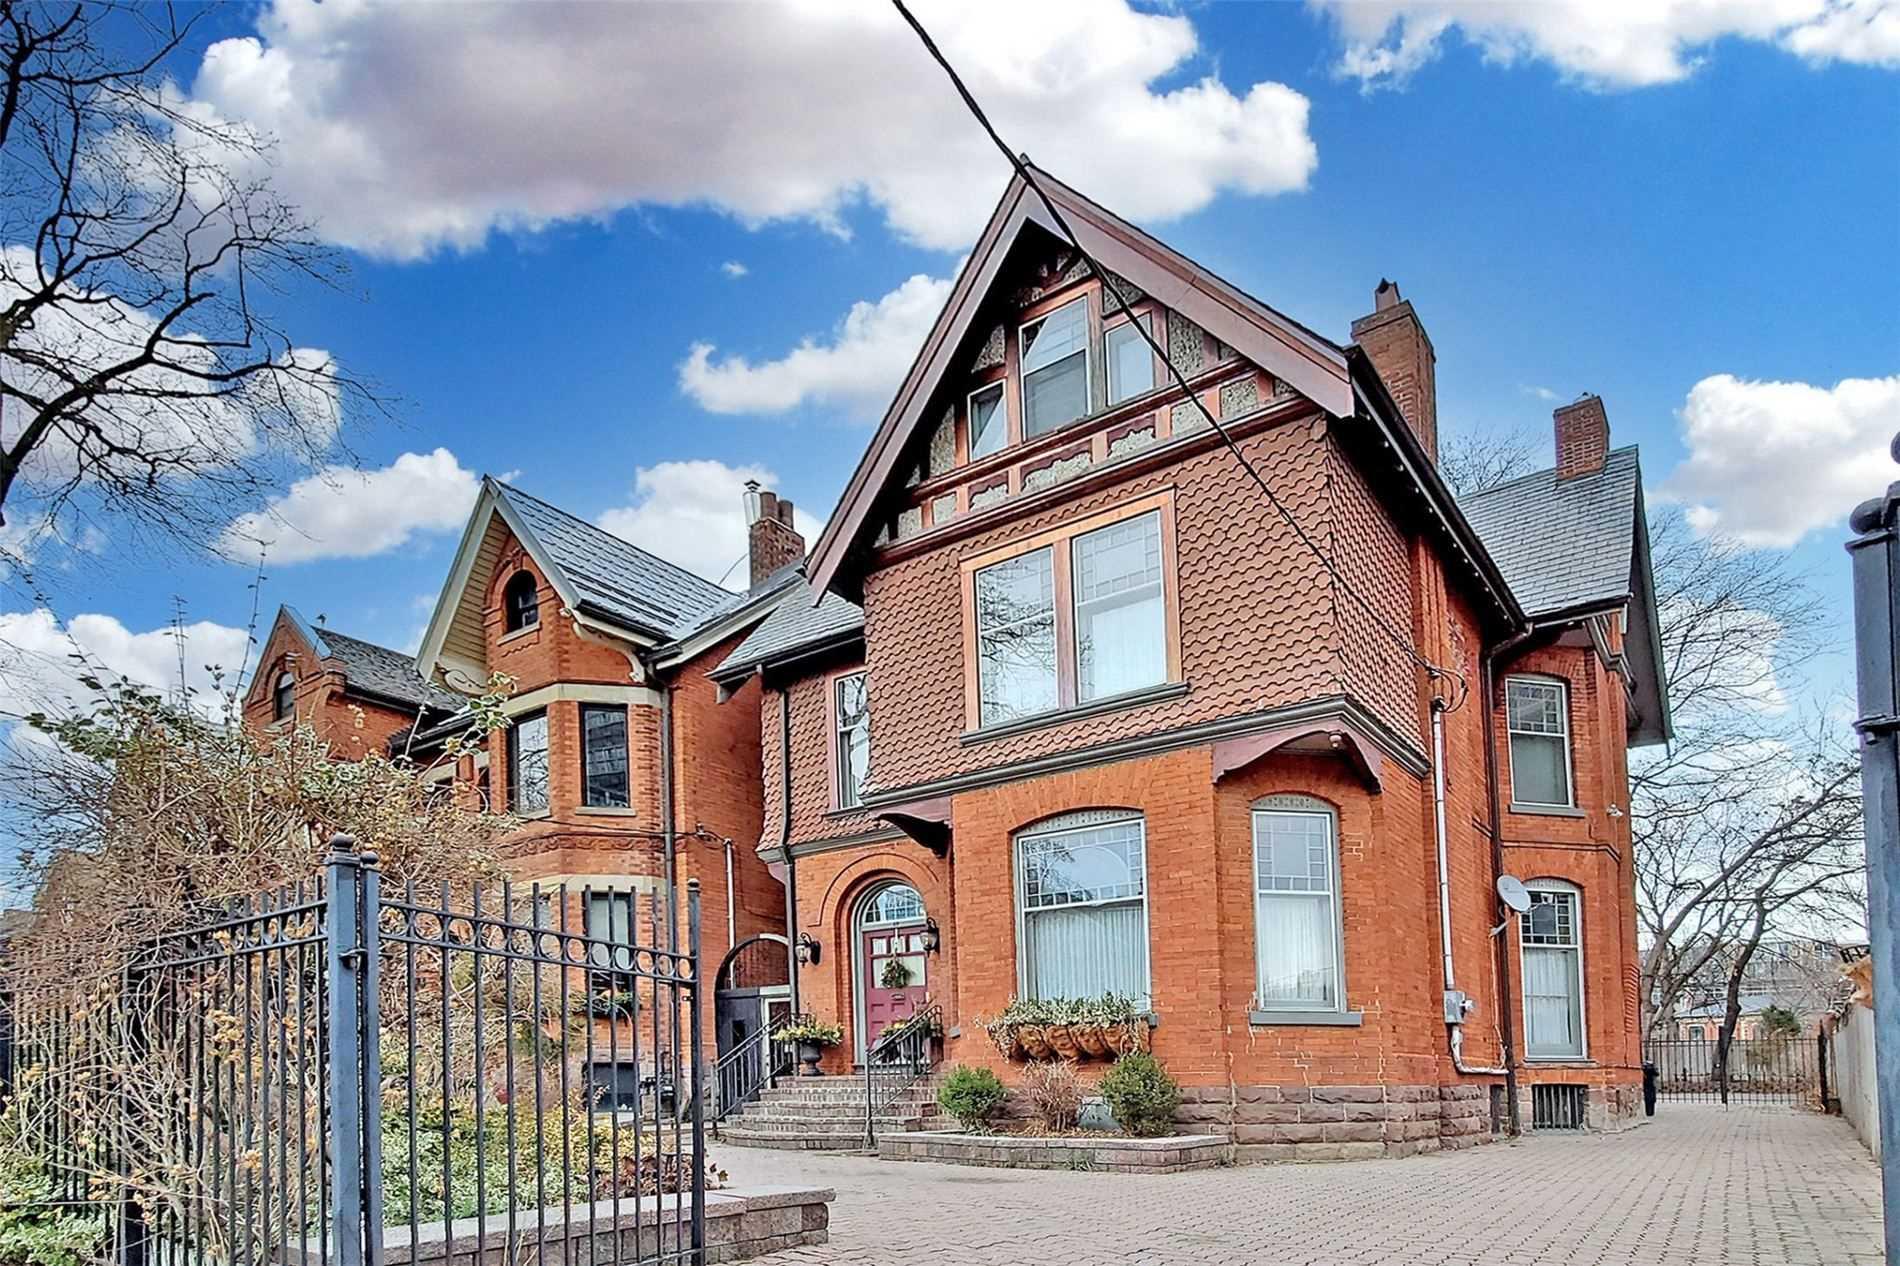 67 Pembroke St, Toronto, Ontario M5A2N9, 6 Bedrooms Bedrooms, 13 Rooms Rooms,4 BathroomsBathrooms,Detached,For Sale,Pembroke,C5071563